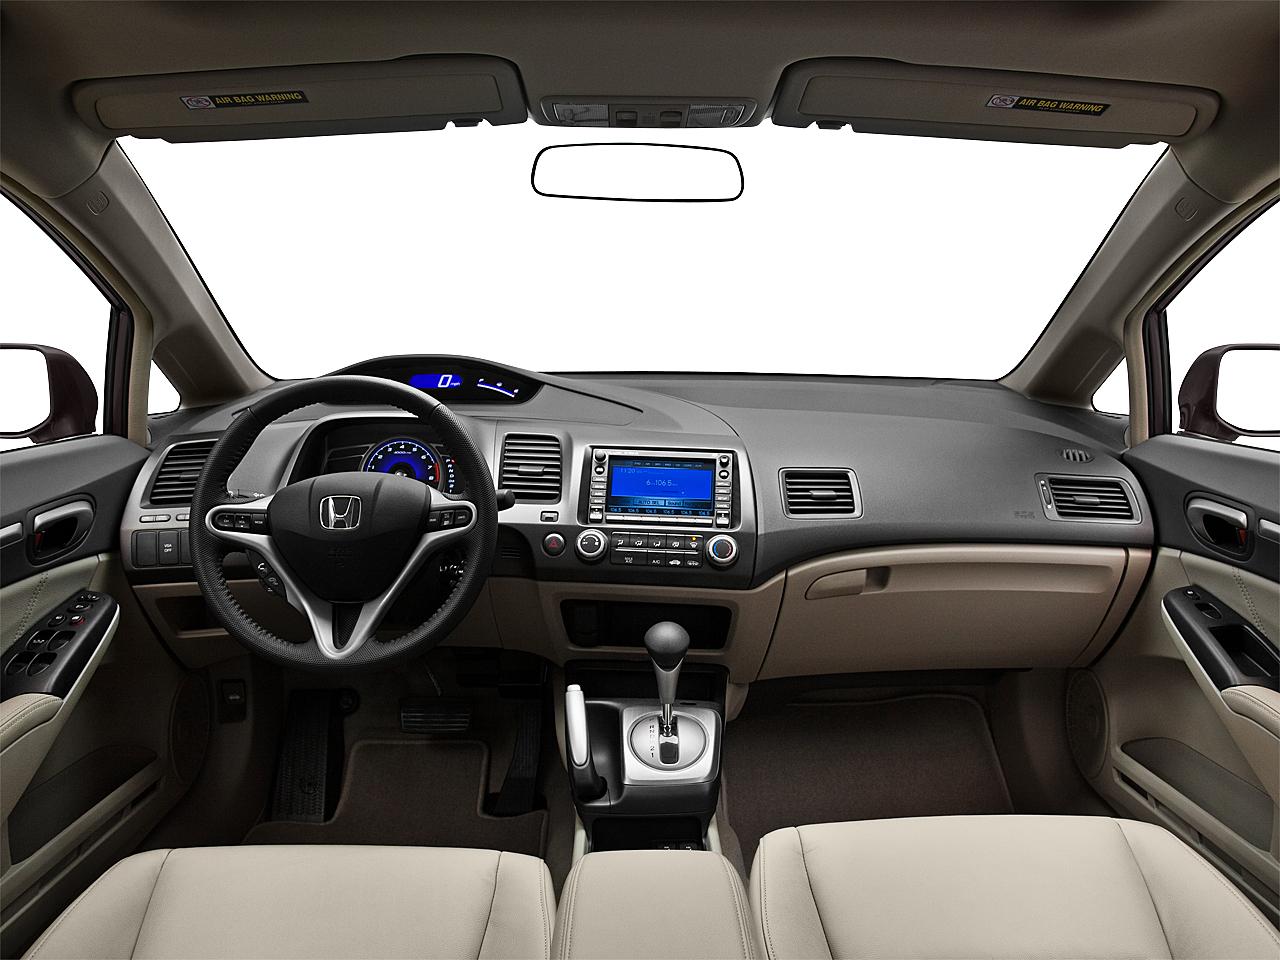 2011 Honda Civic Ex L 4dr Sedan 5a W Navi Research Groovecar